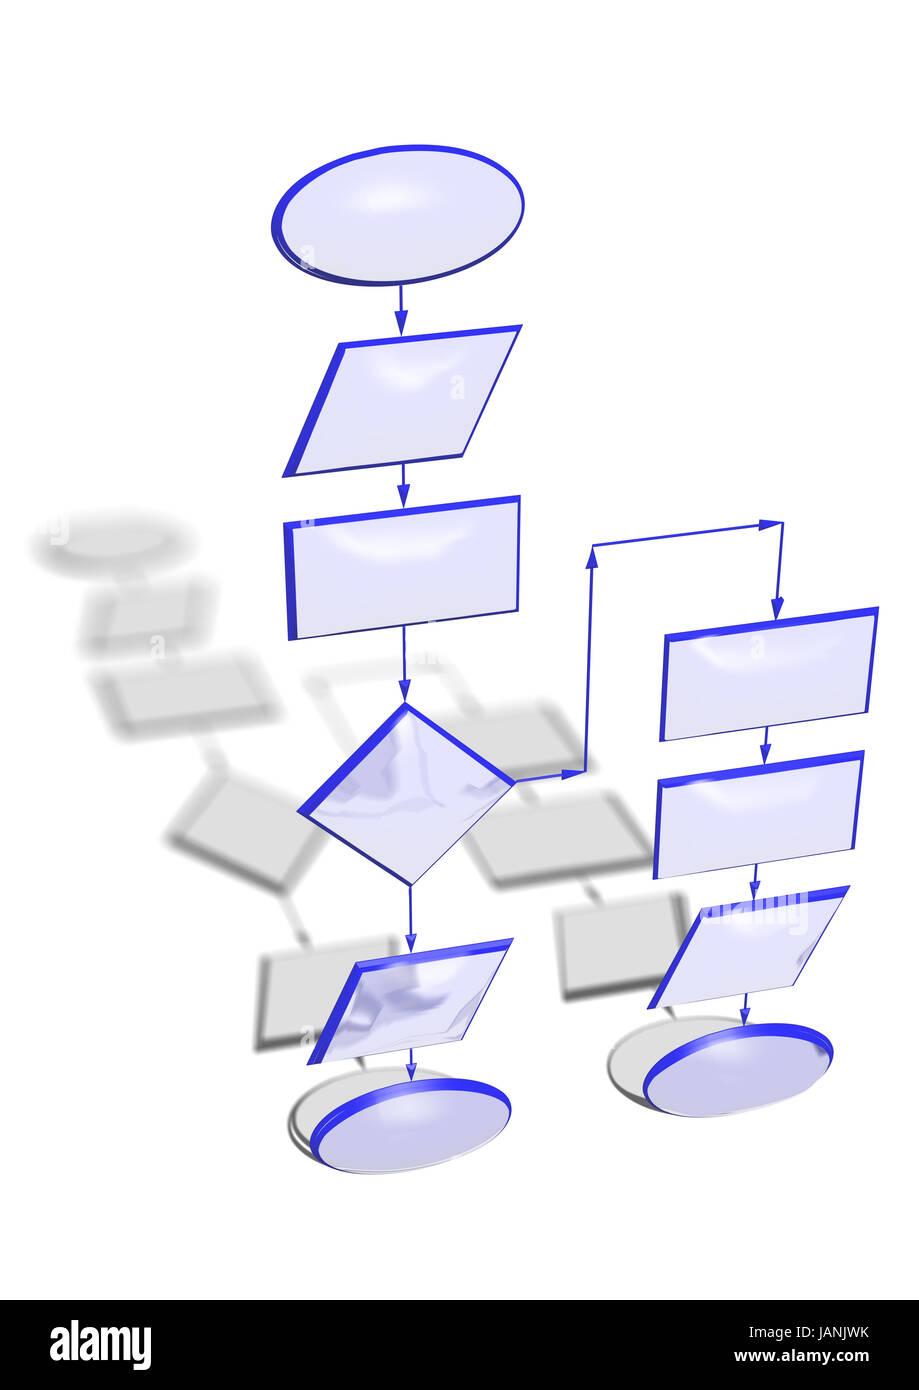 medium resolution of empty flow chart diagram use for programming